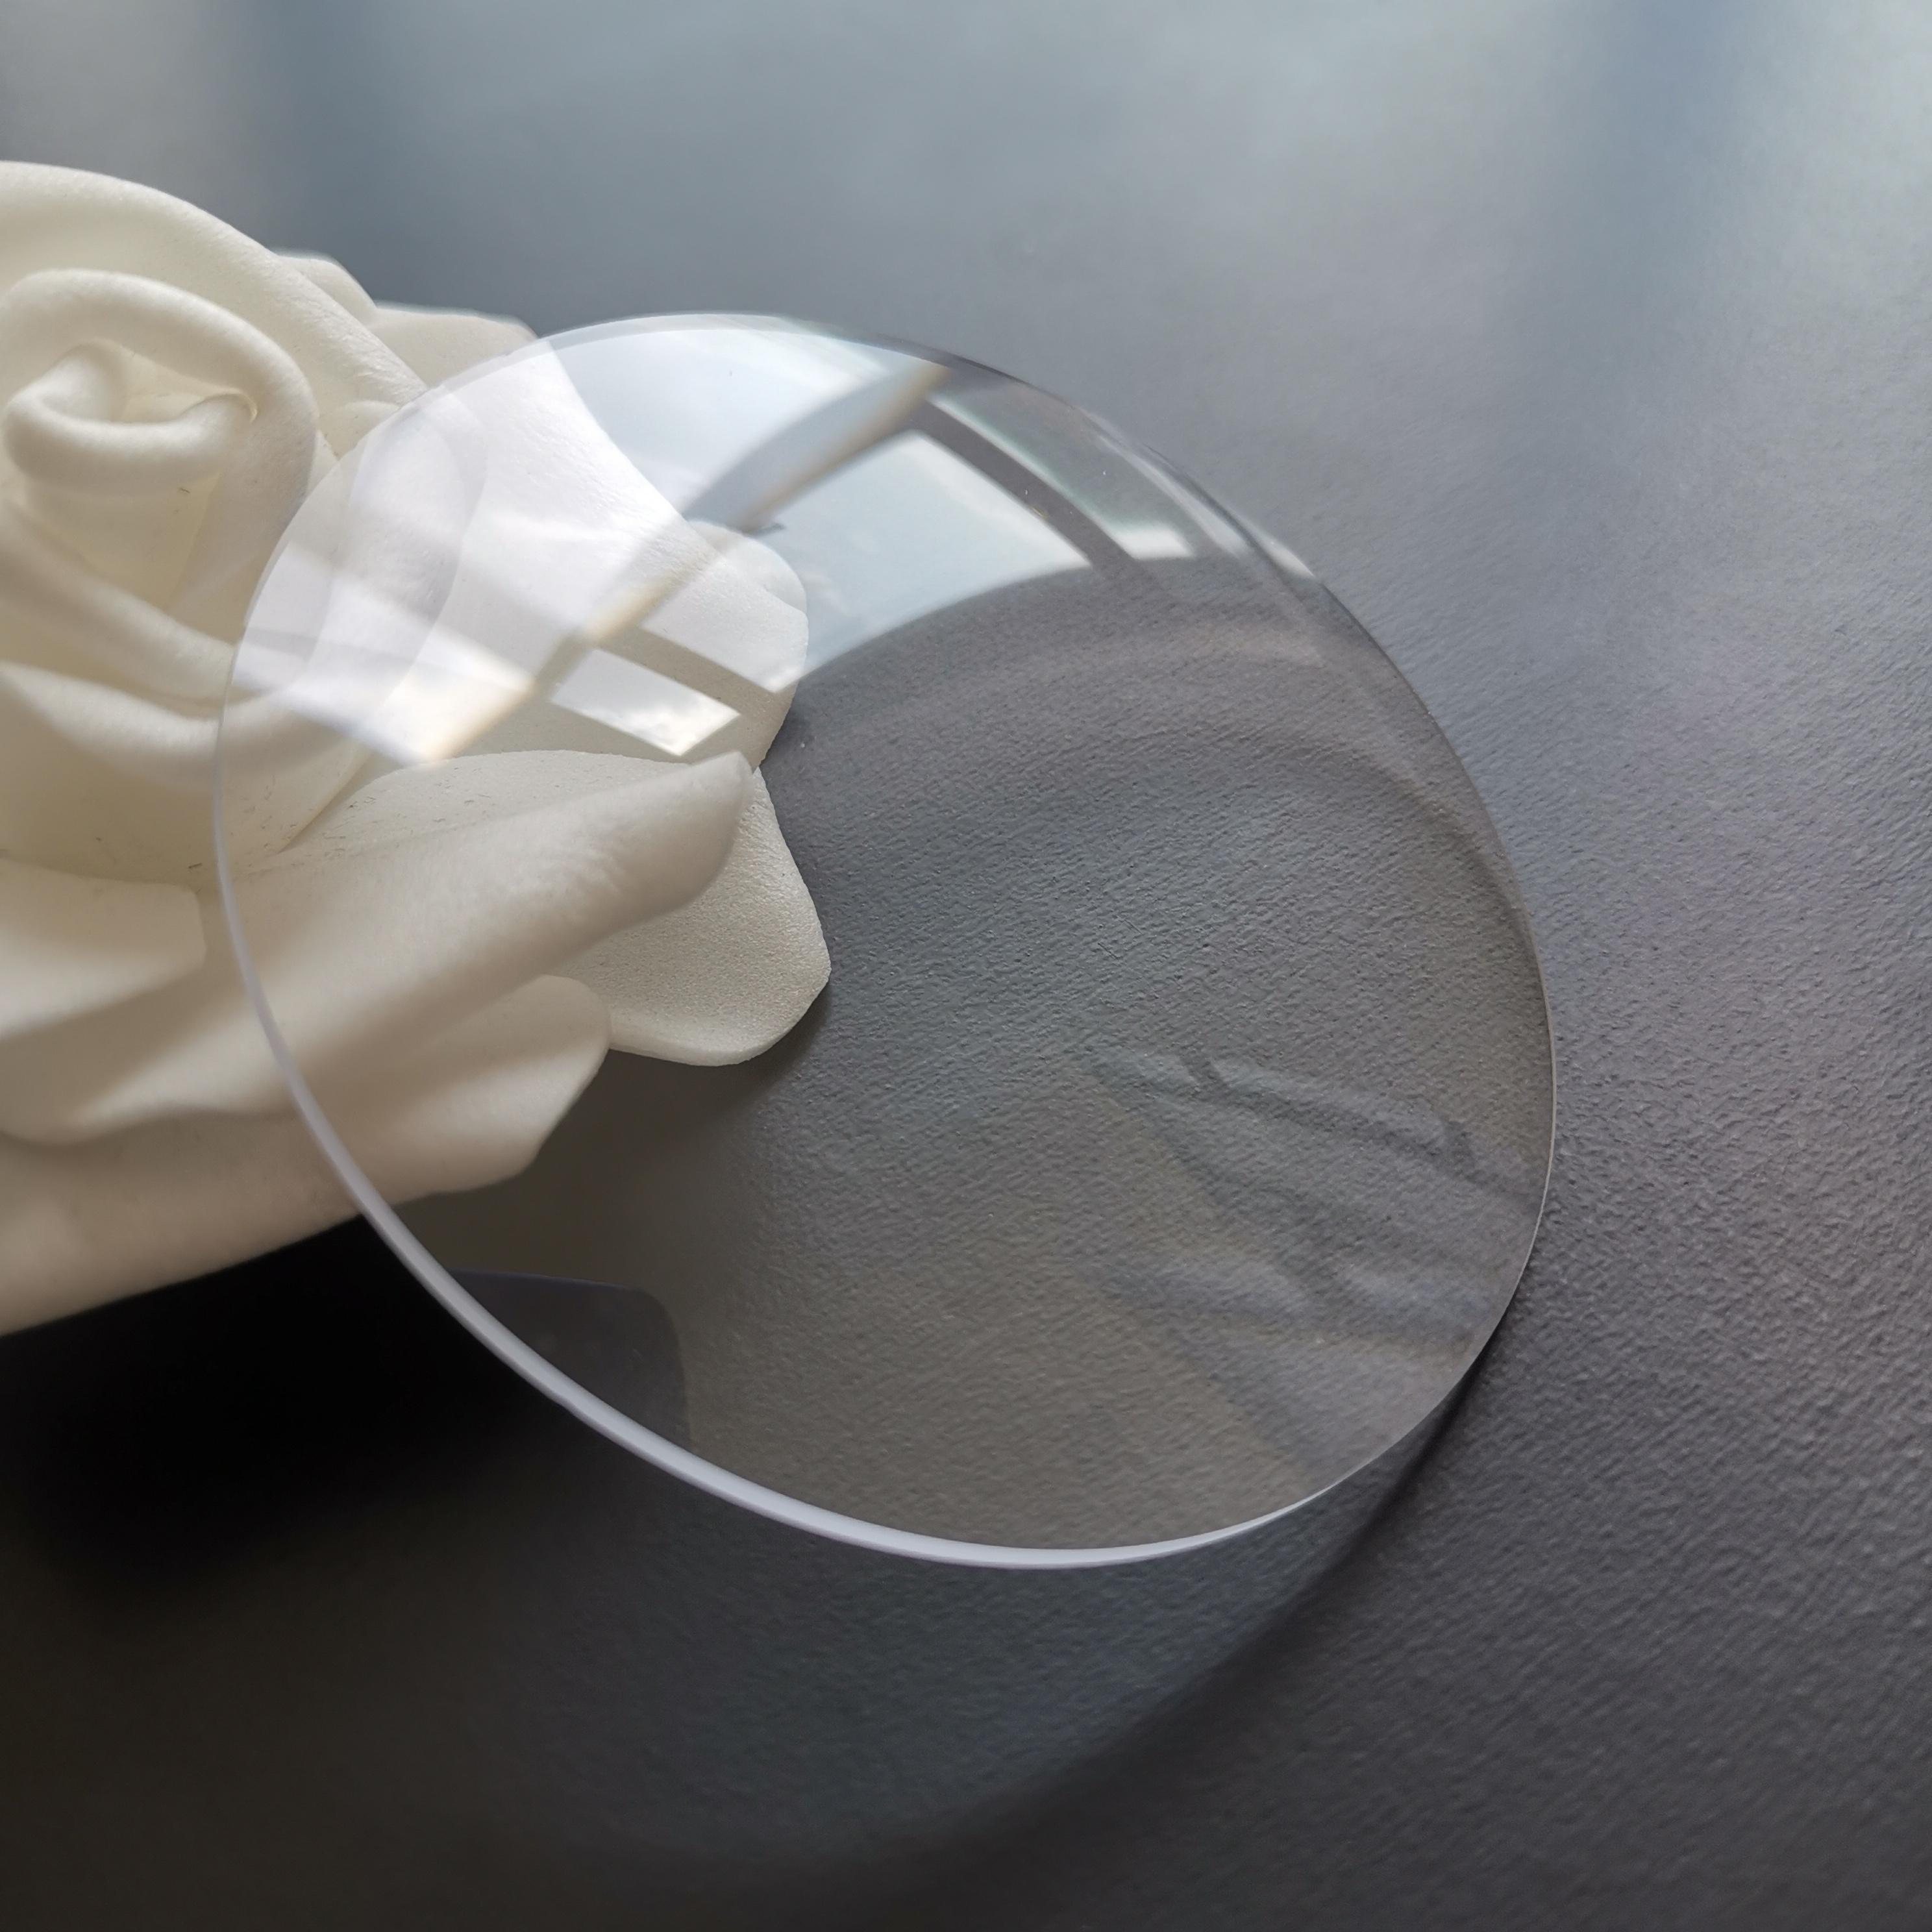 cr39 uc 1.49 uncoating 65mm hot sale wholesale eyeglass lenses